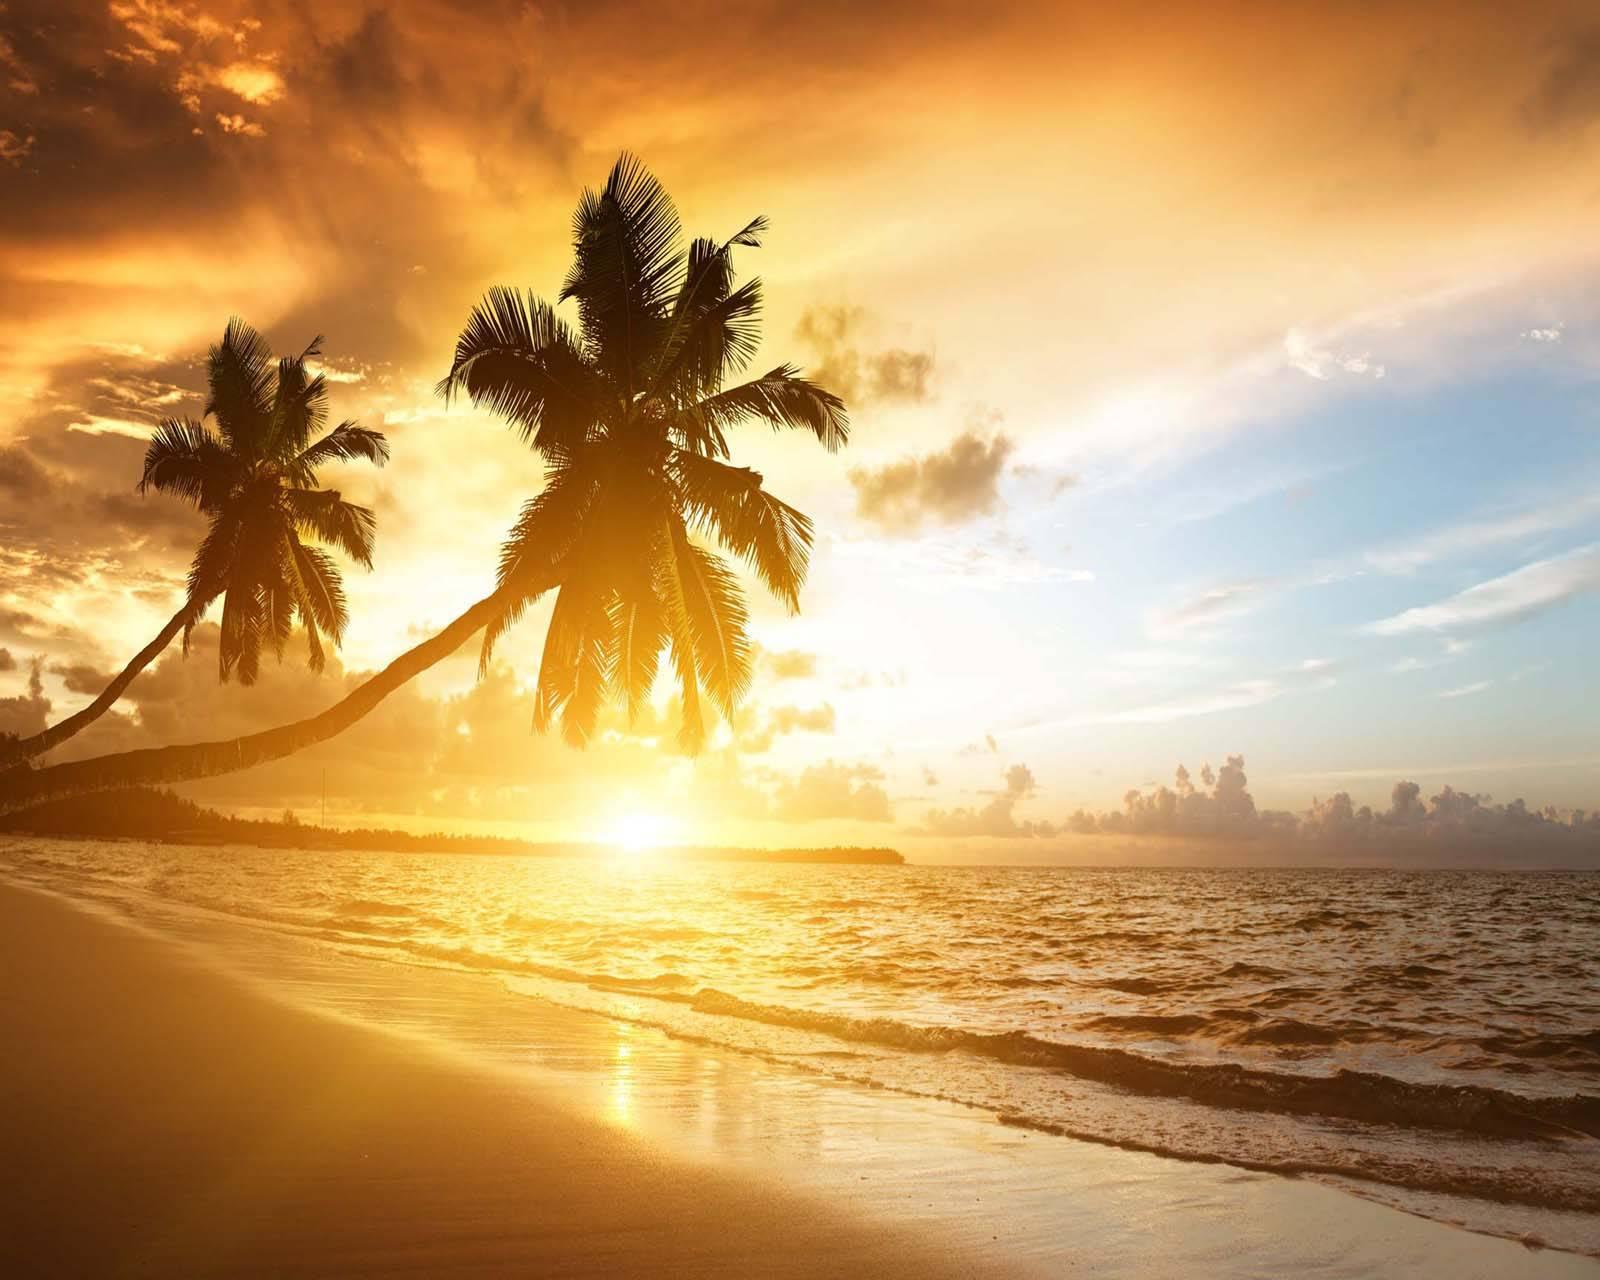 Scenery sunrise